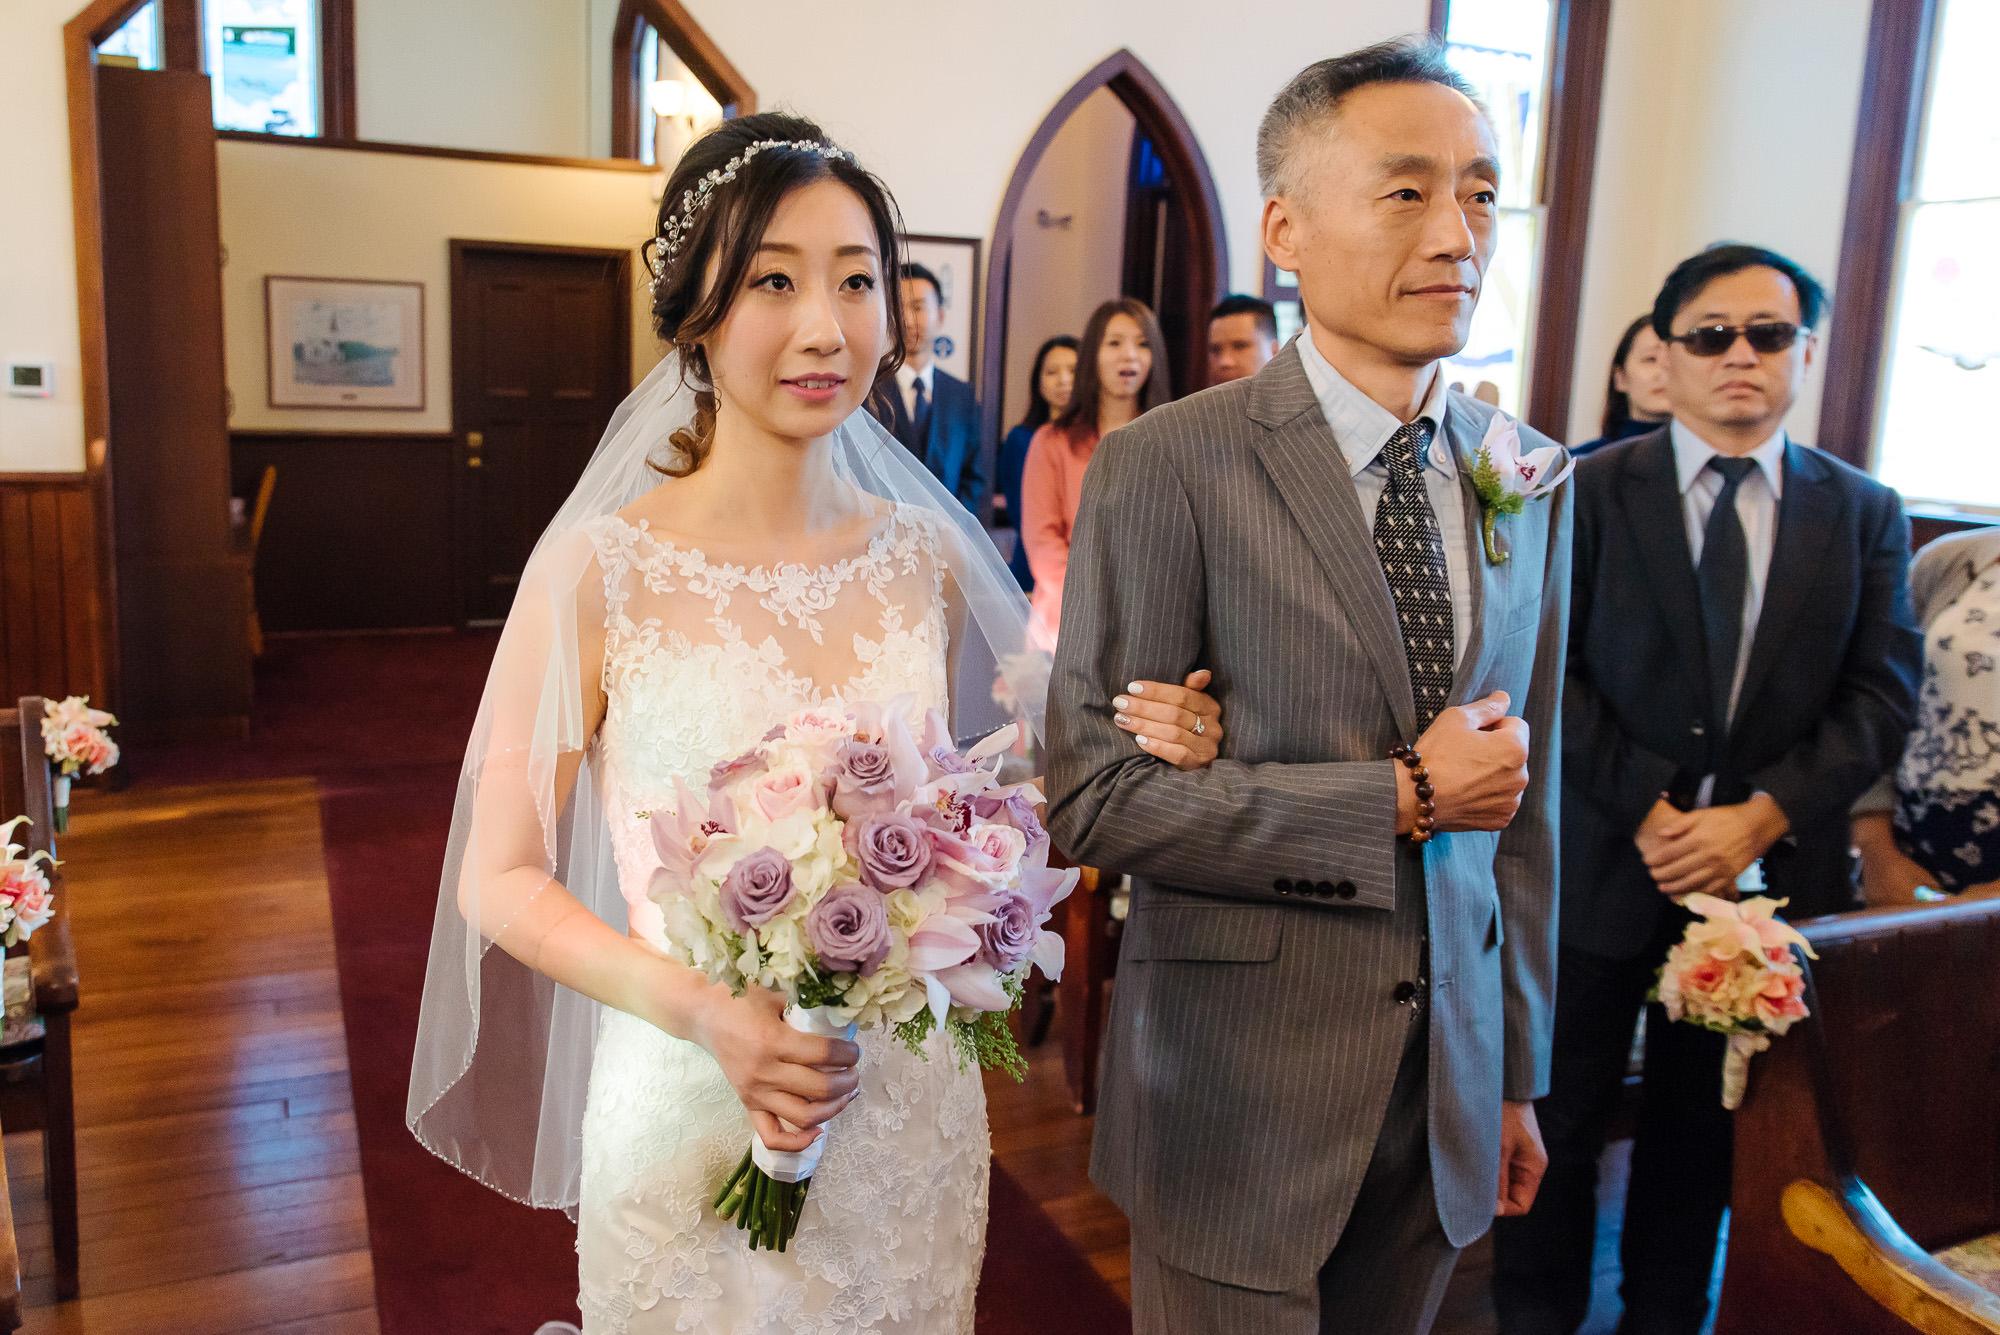 minoru_chapel_richmond_wedding_ceremony 1604103.jpg